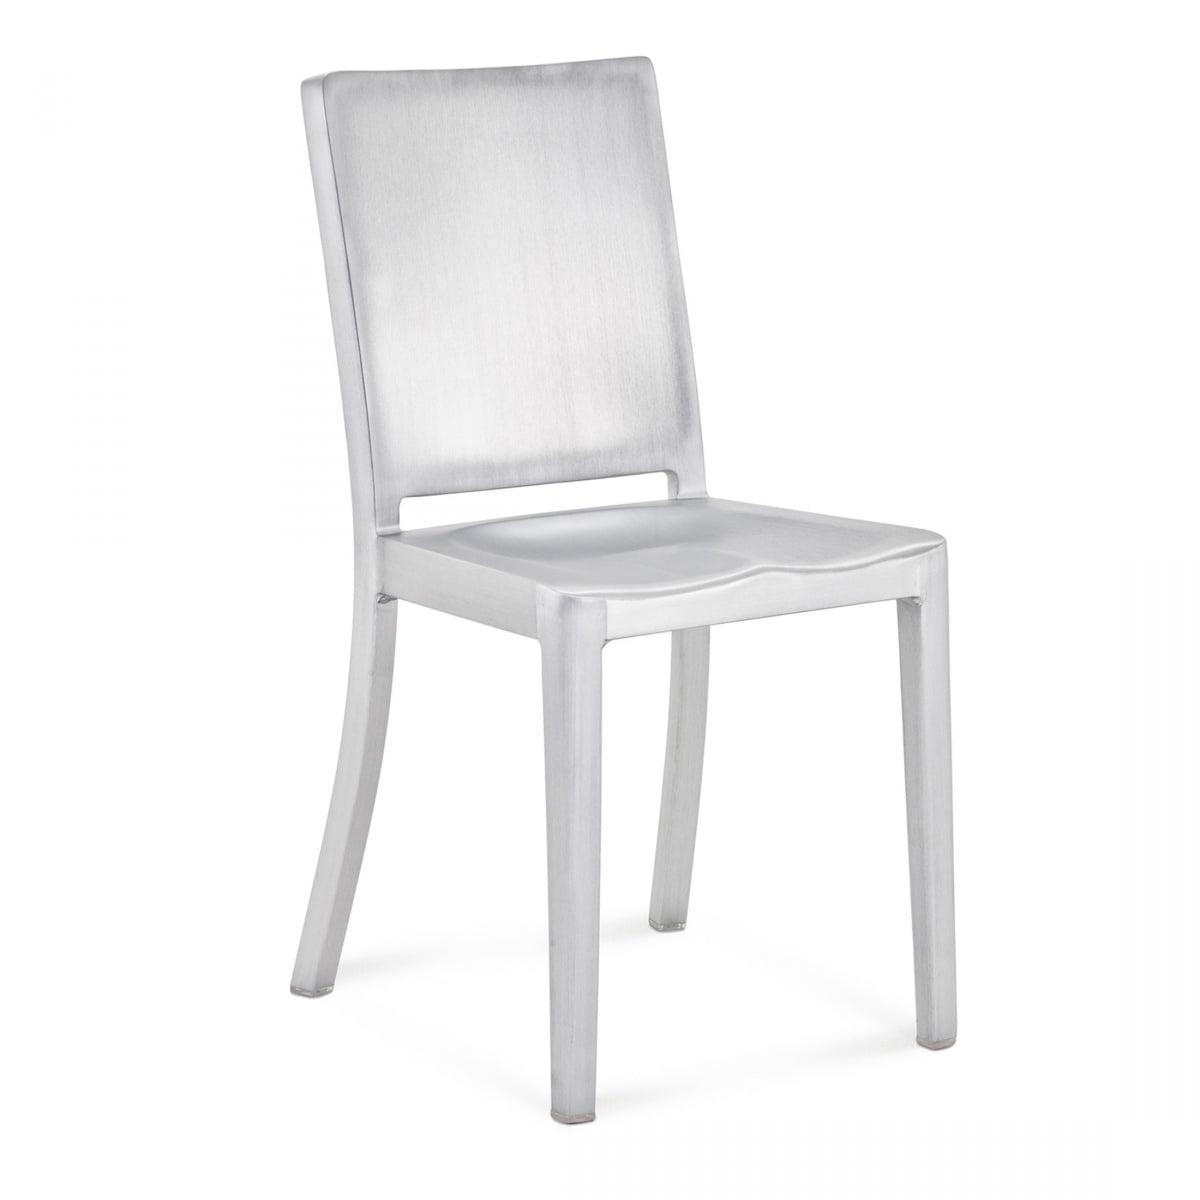 hudson chair  emeco  shop - emeco  hudson chair